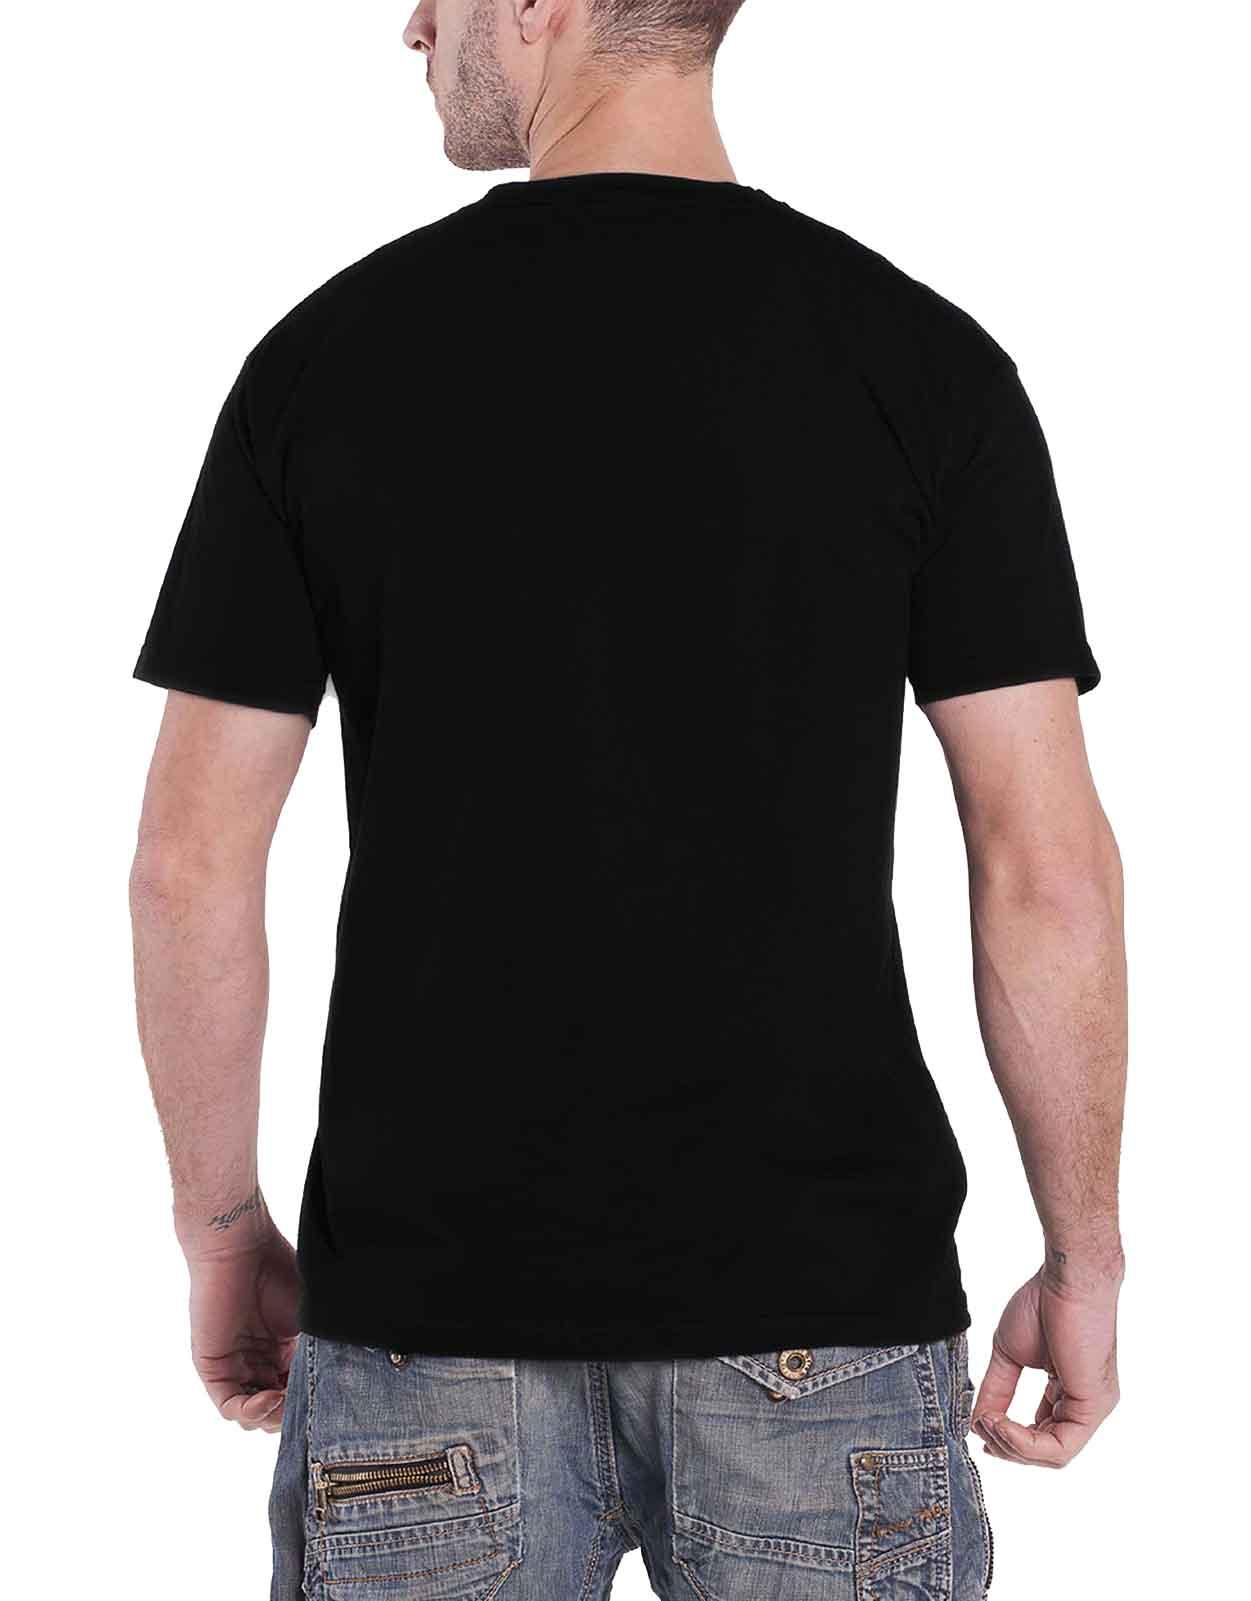 Officiel-Jimi-Hendrix-T-Shirt-Purple-Haze-Are-you-experienced-Logo-Homme-NEUF miniature 7